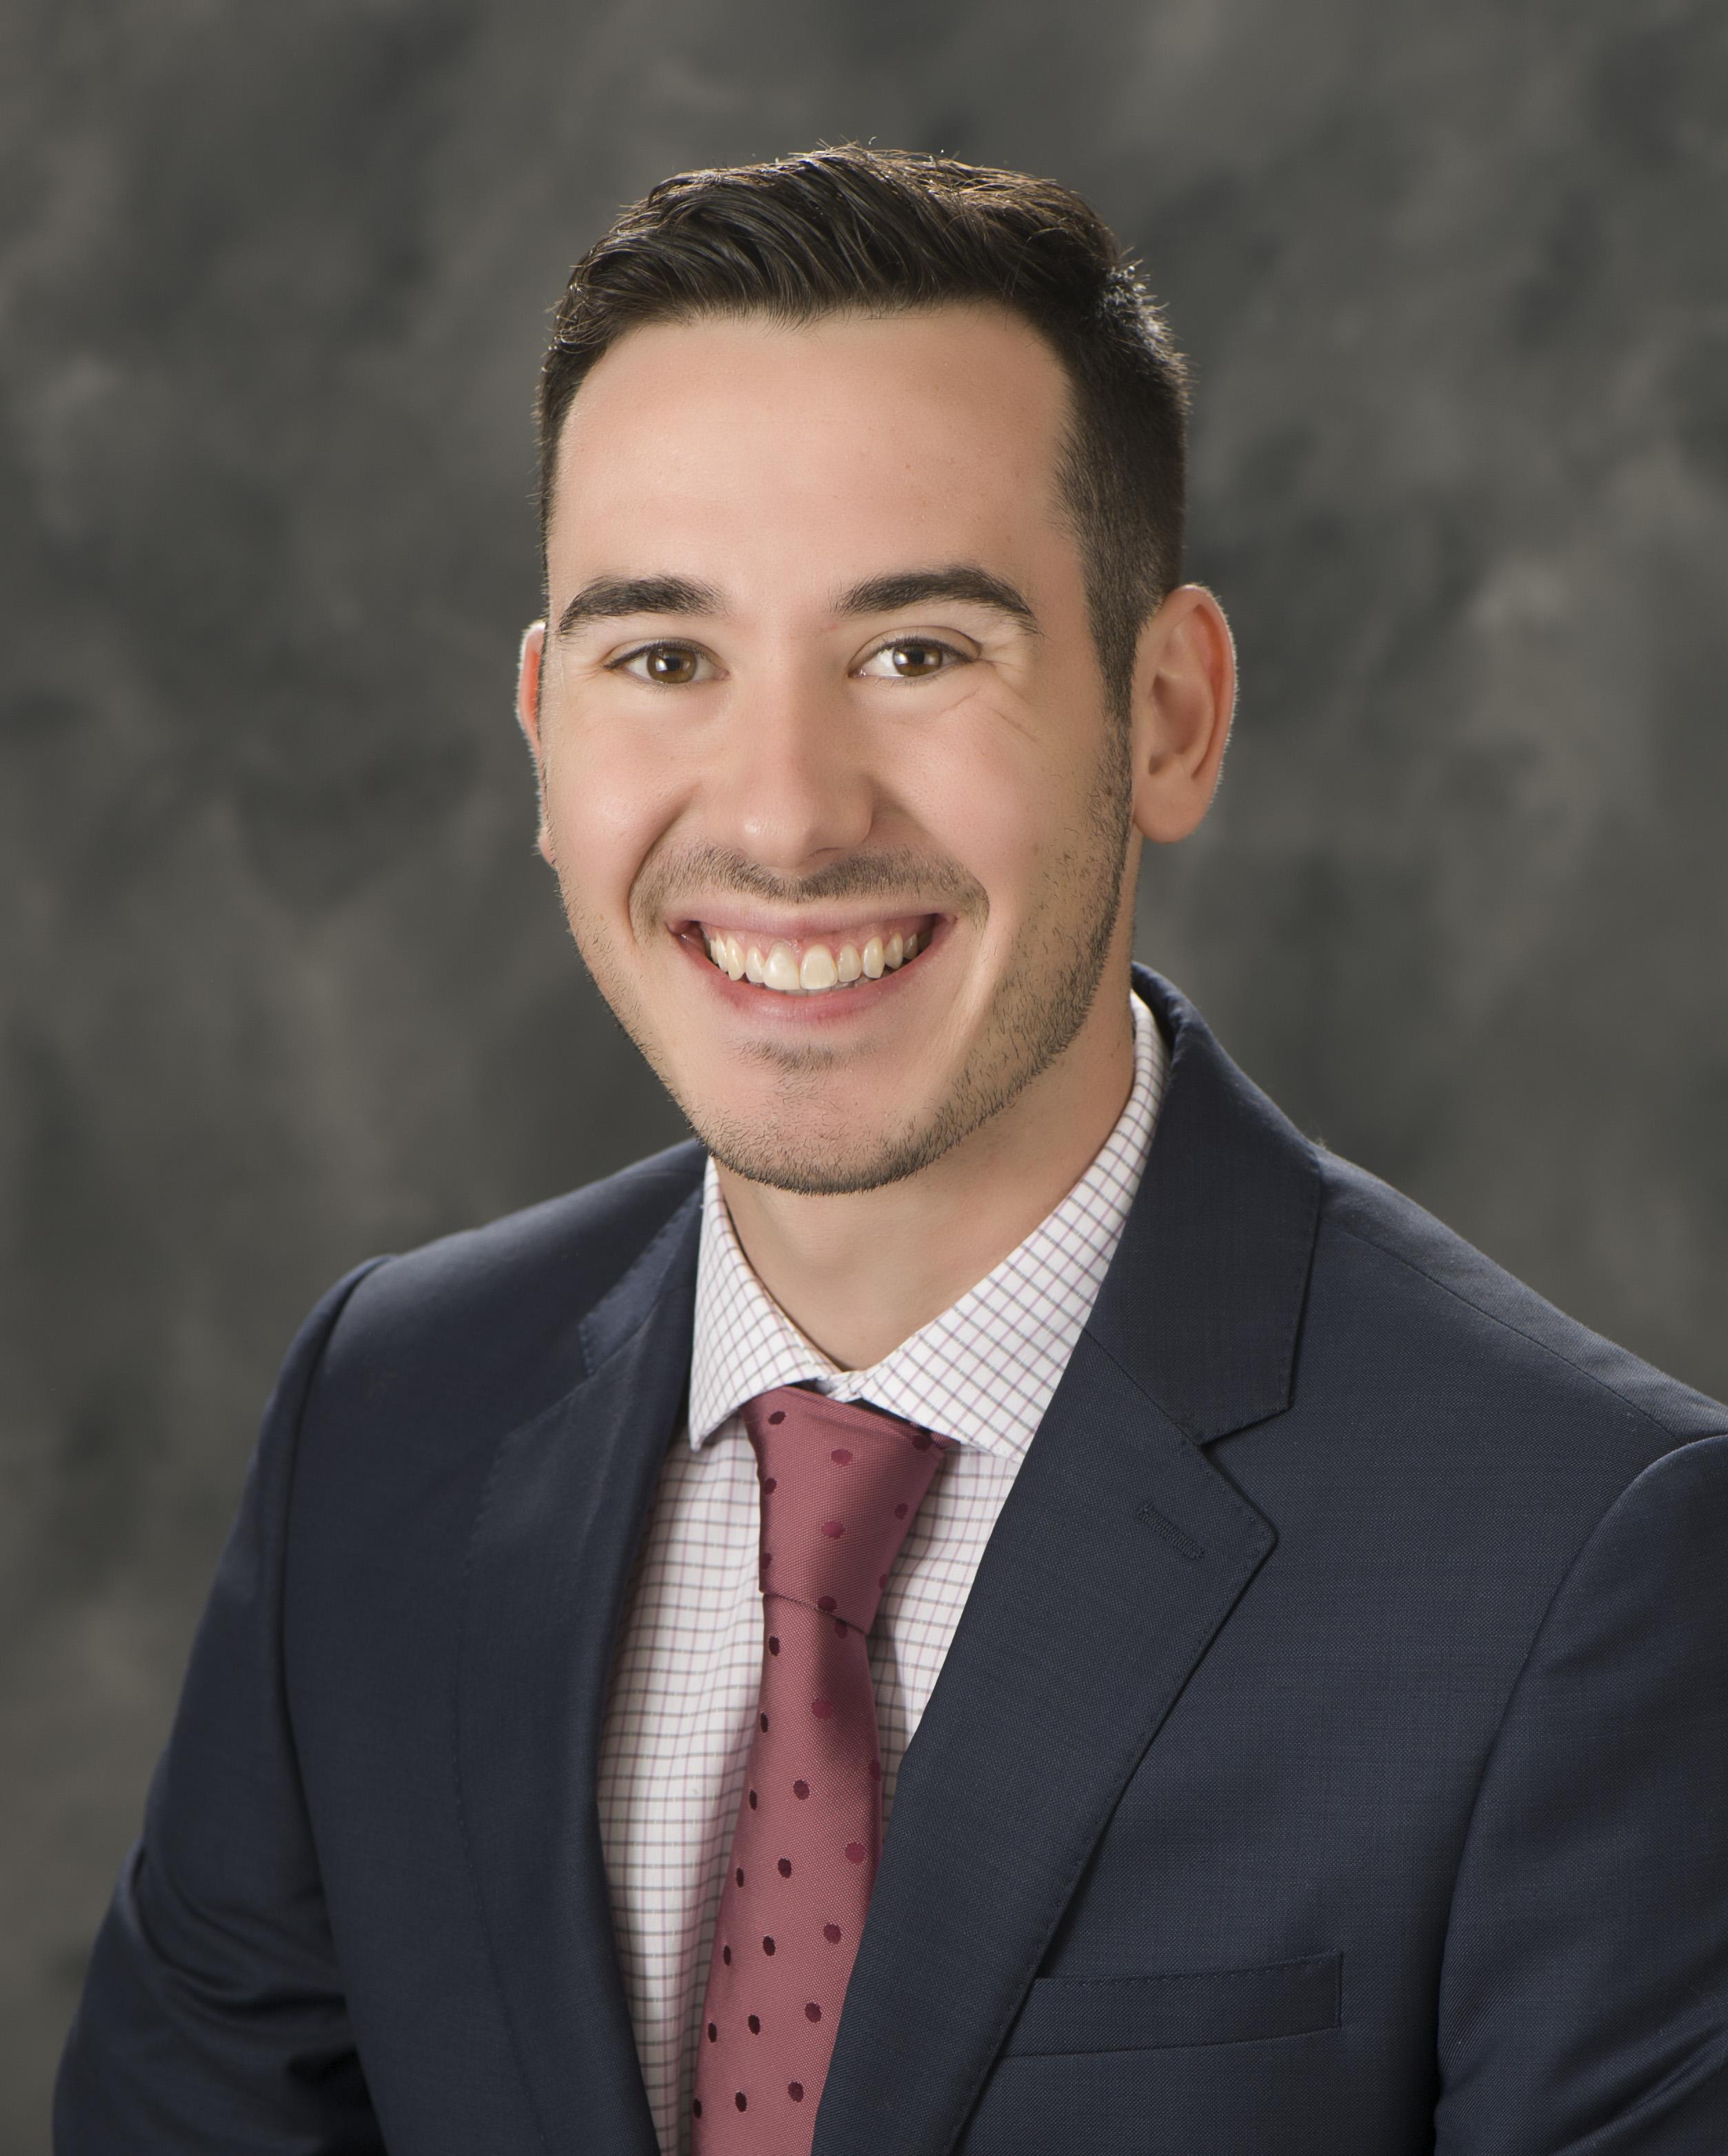 sports sales manager Zach Franklin